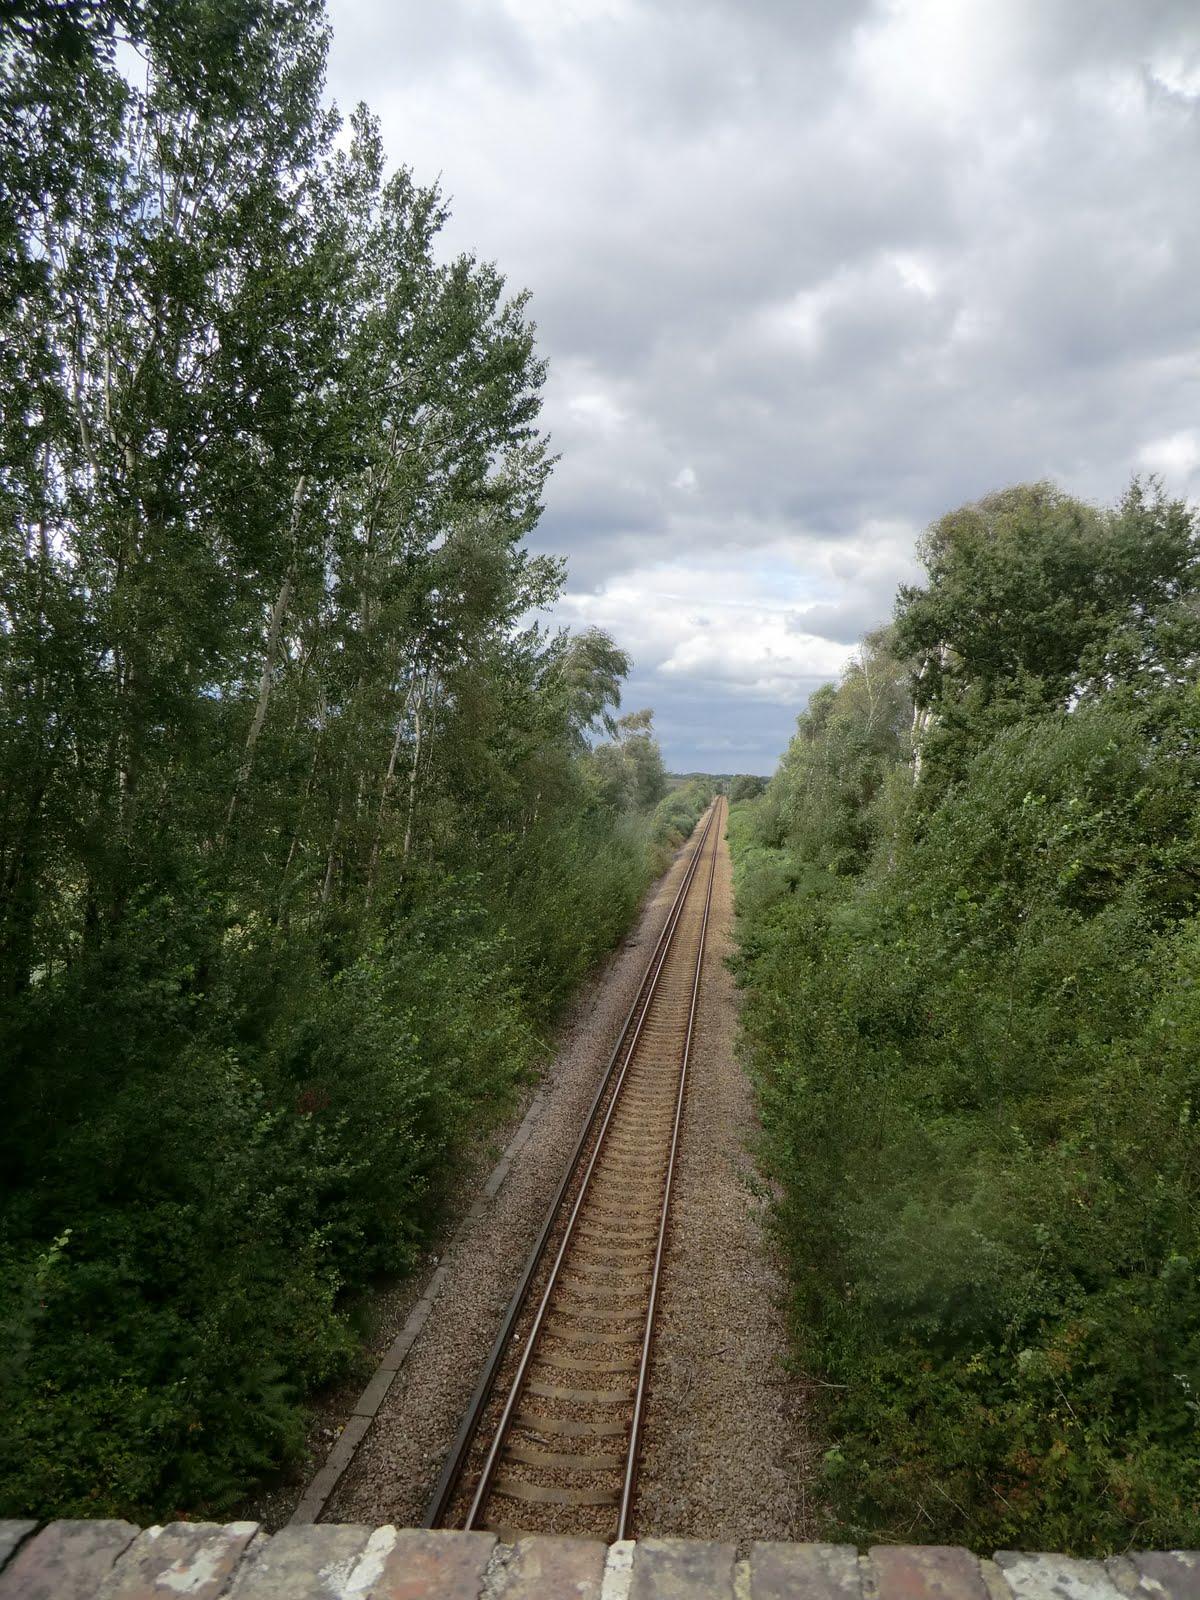 CIMG4330 Crossing the Lymington branch line